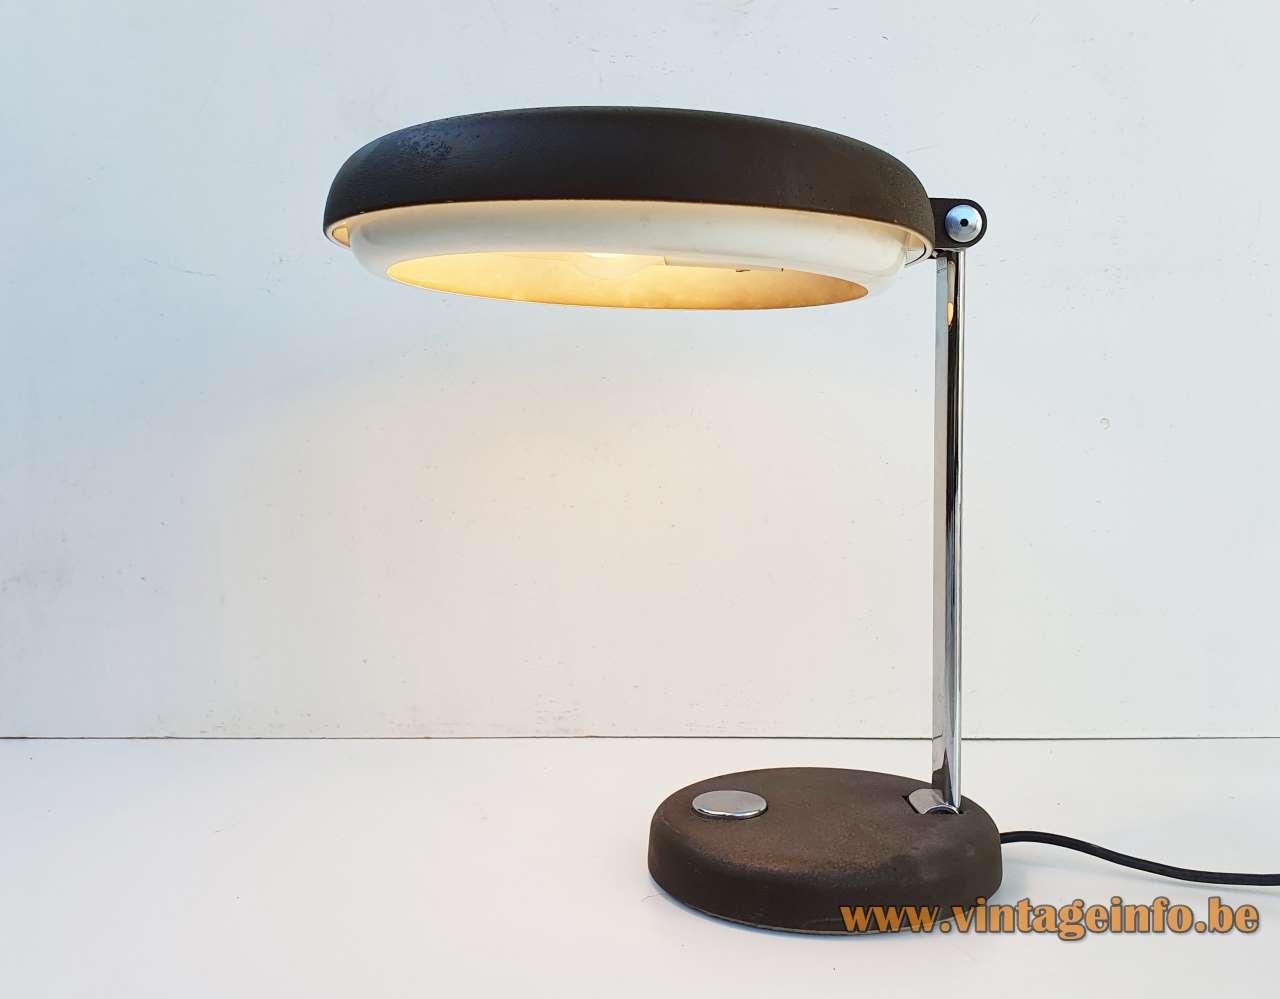 Hillebrand desk lamp Heinz Georg Pfaender chrome black metal Germany 1970s 2 E27 sockets MCM Mid-Century Modern